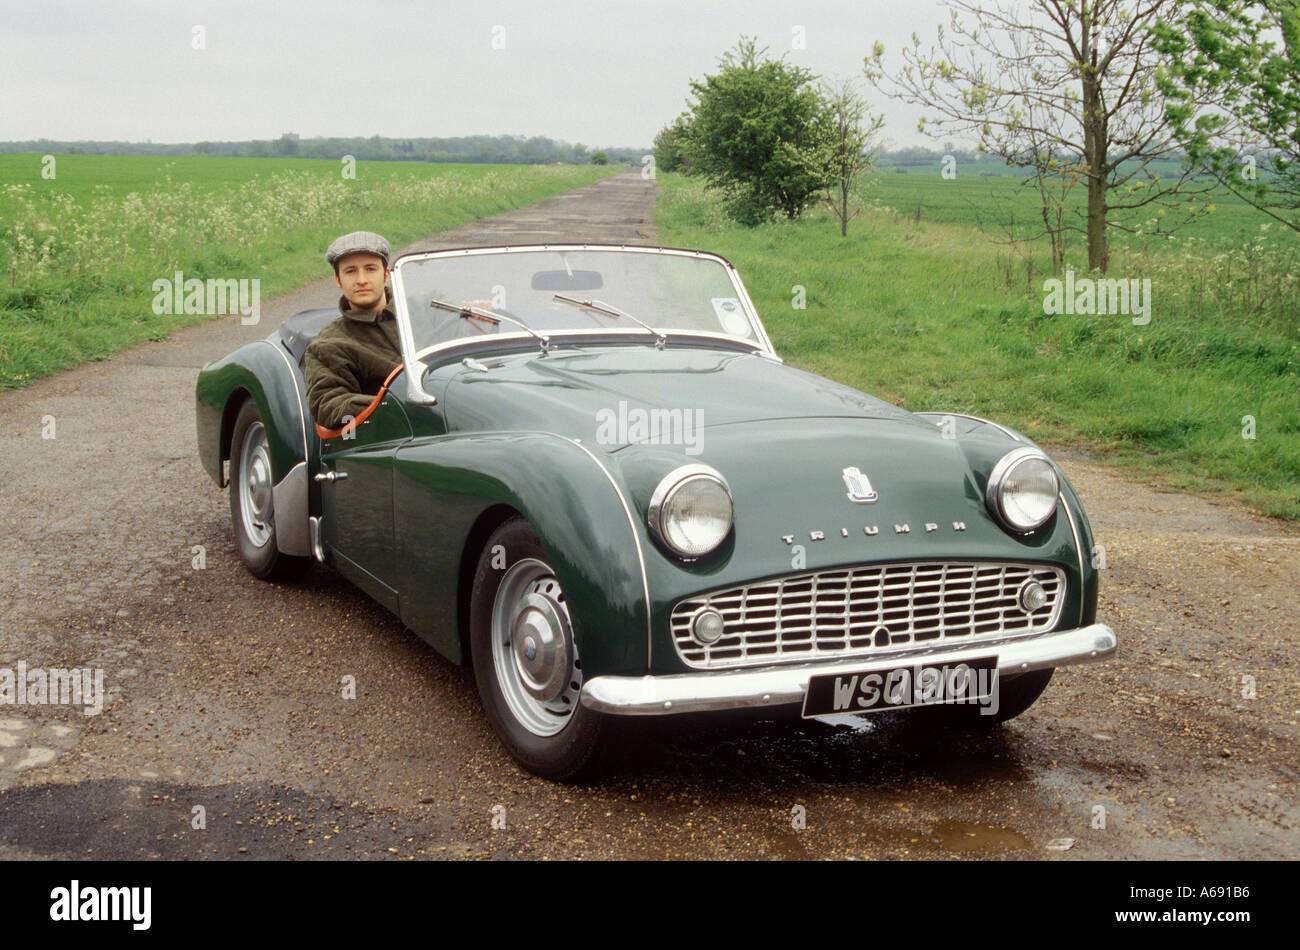 posh bloke with car 3 - Stock Image